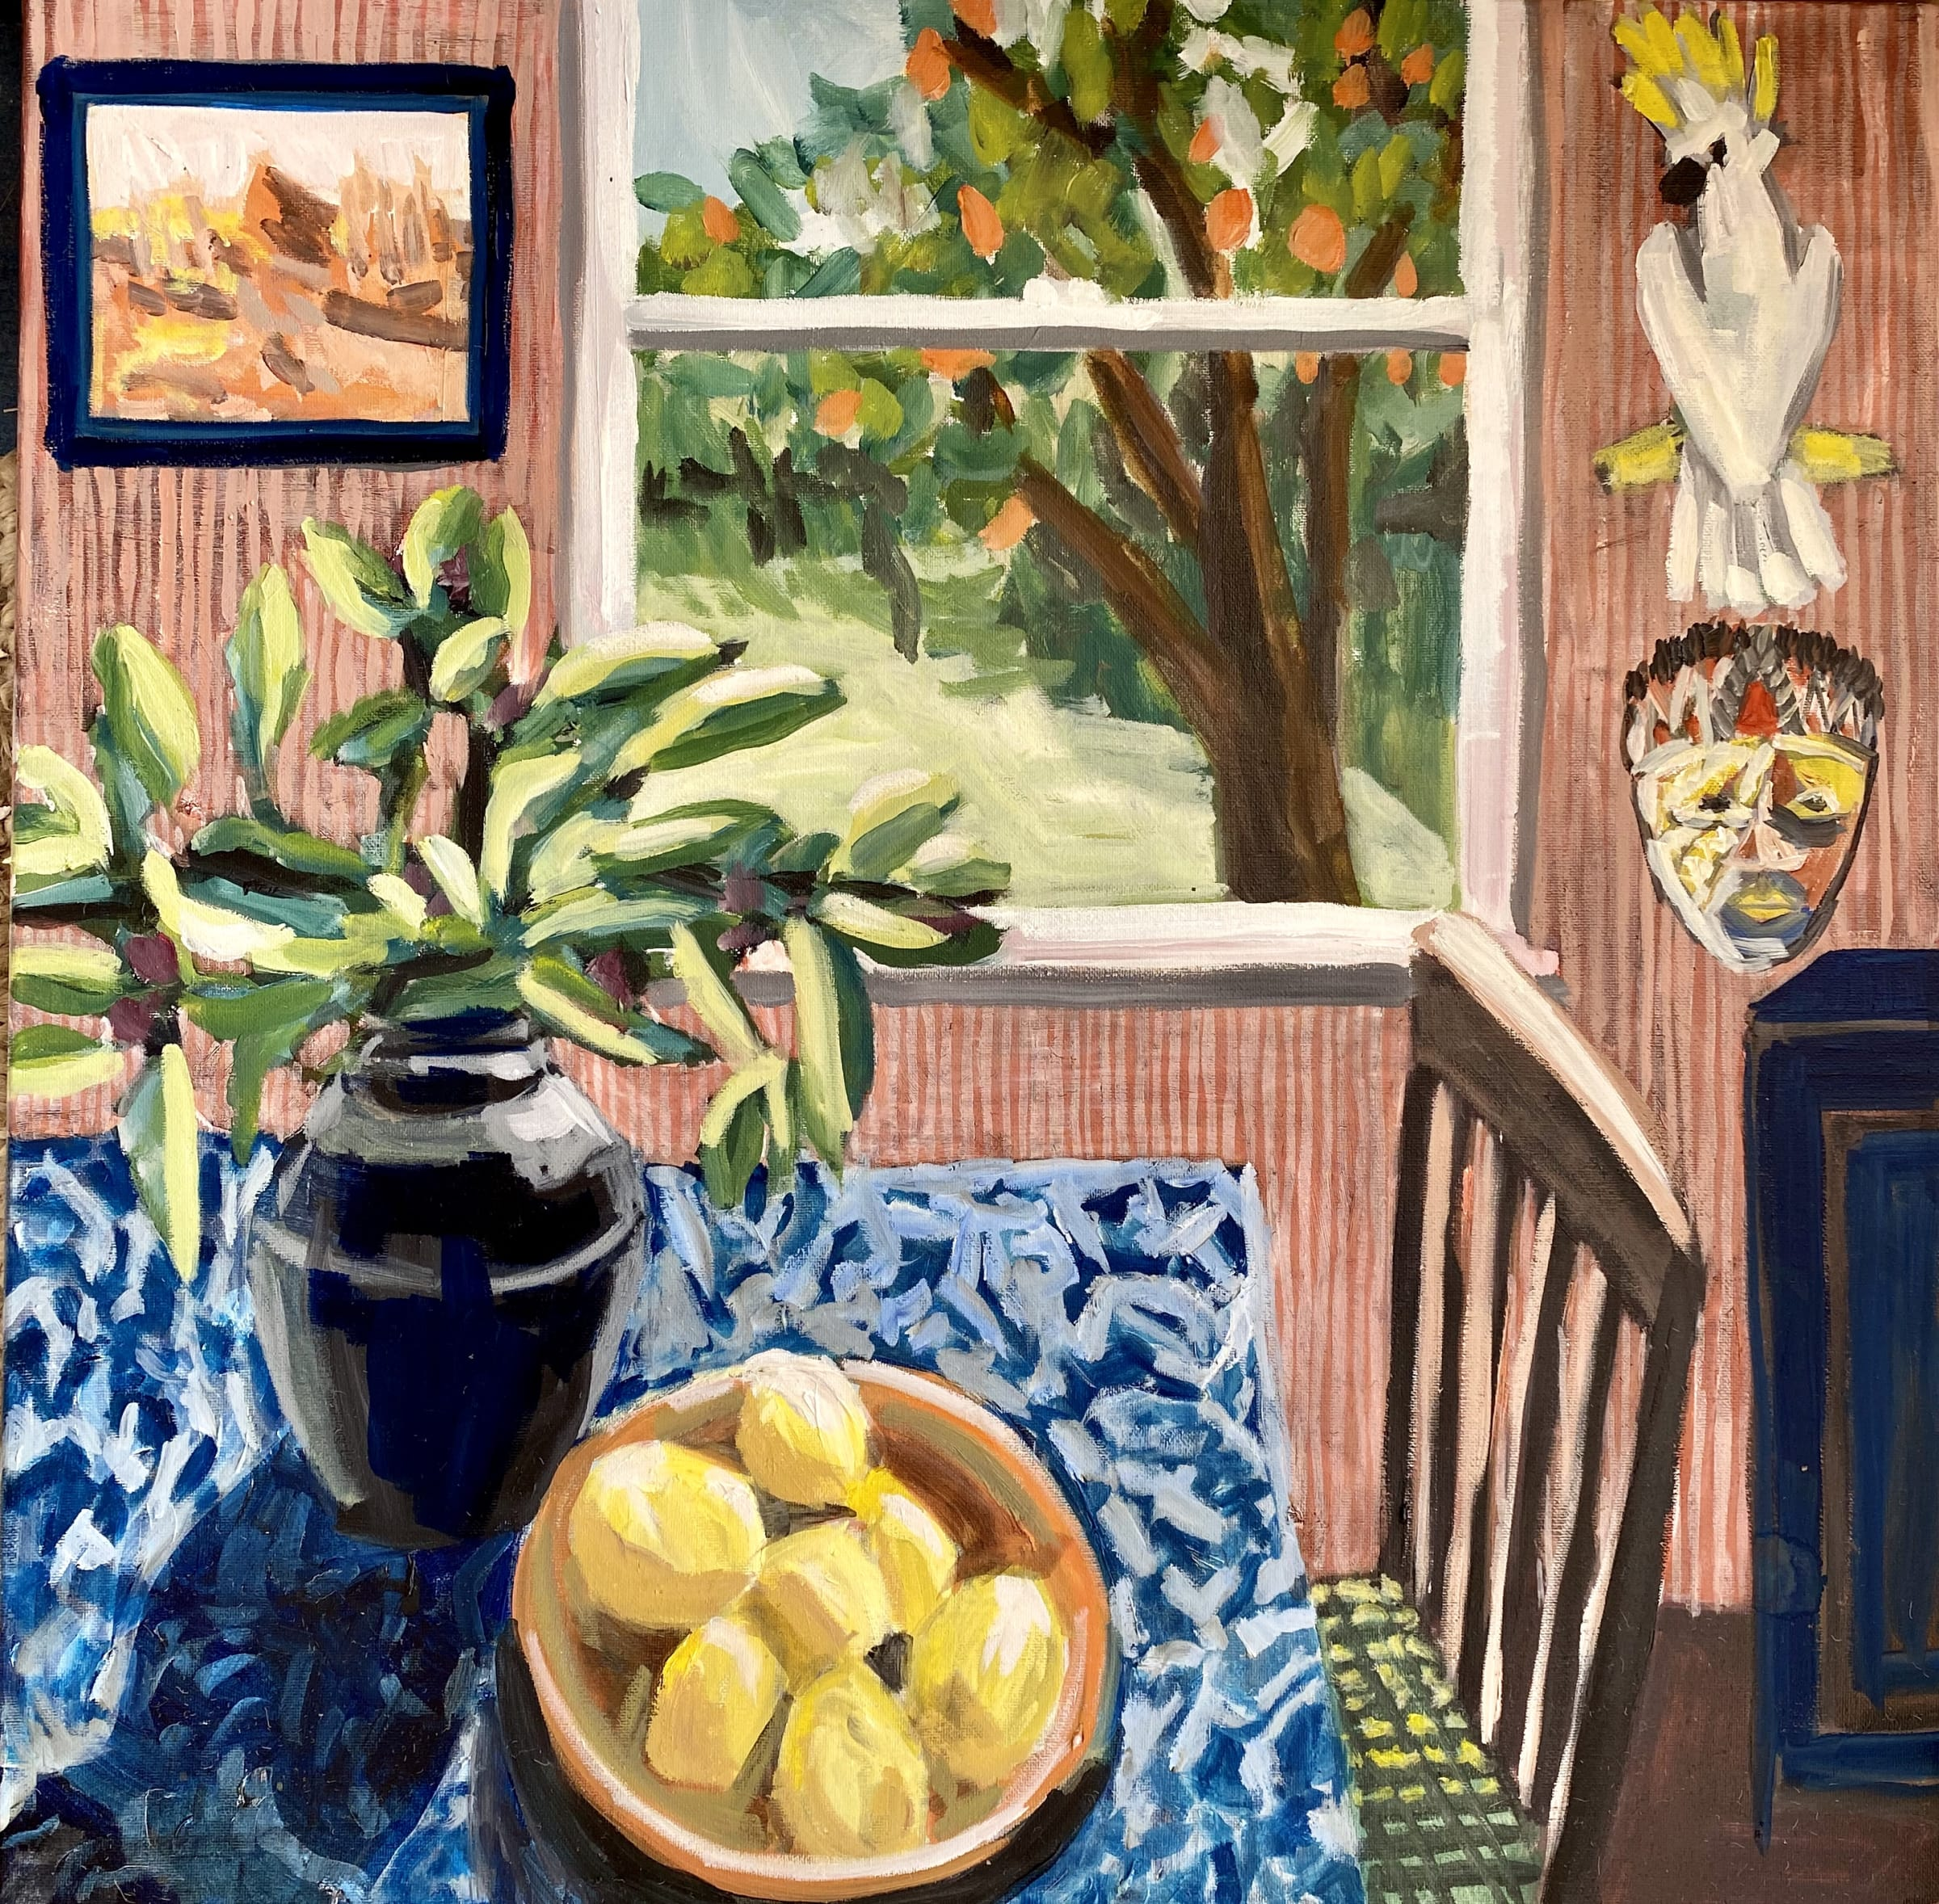 "<span class=""link fancybox-details-link""><a href=""/artists/88-kate-nielsen/works/1252-kate-nielsen-daphne-with-lemons-orange-tree/"">View Detail Page</a></span><div class=""artist""><strong>Kate Nielsen</strong></div> <div class=""title""><em>Daphne With Lemons & Orange Tree</em></div> <div class=""medium"">Oil on canvas</div> <div class=""dimensions"">16 x 16 inches (framed in light Tasmanian oak)</div>"